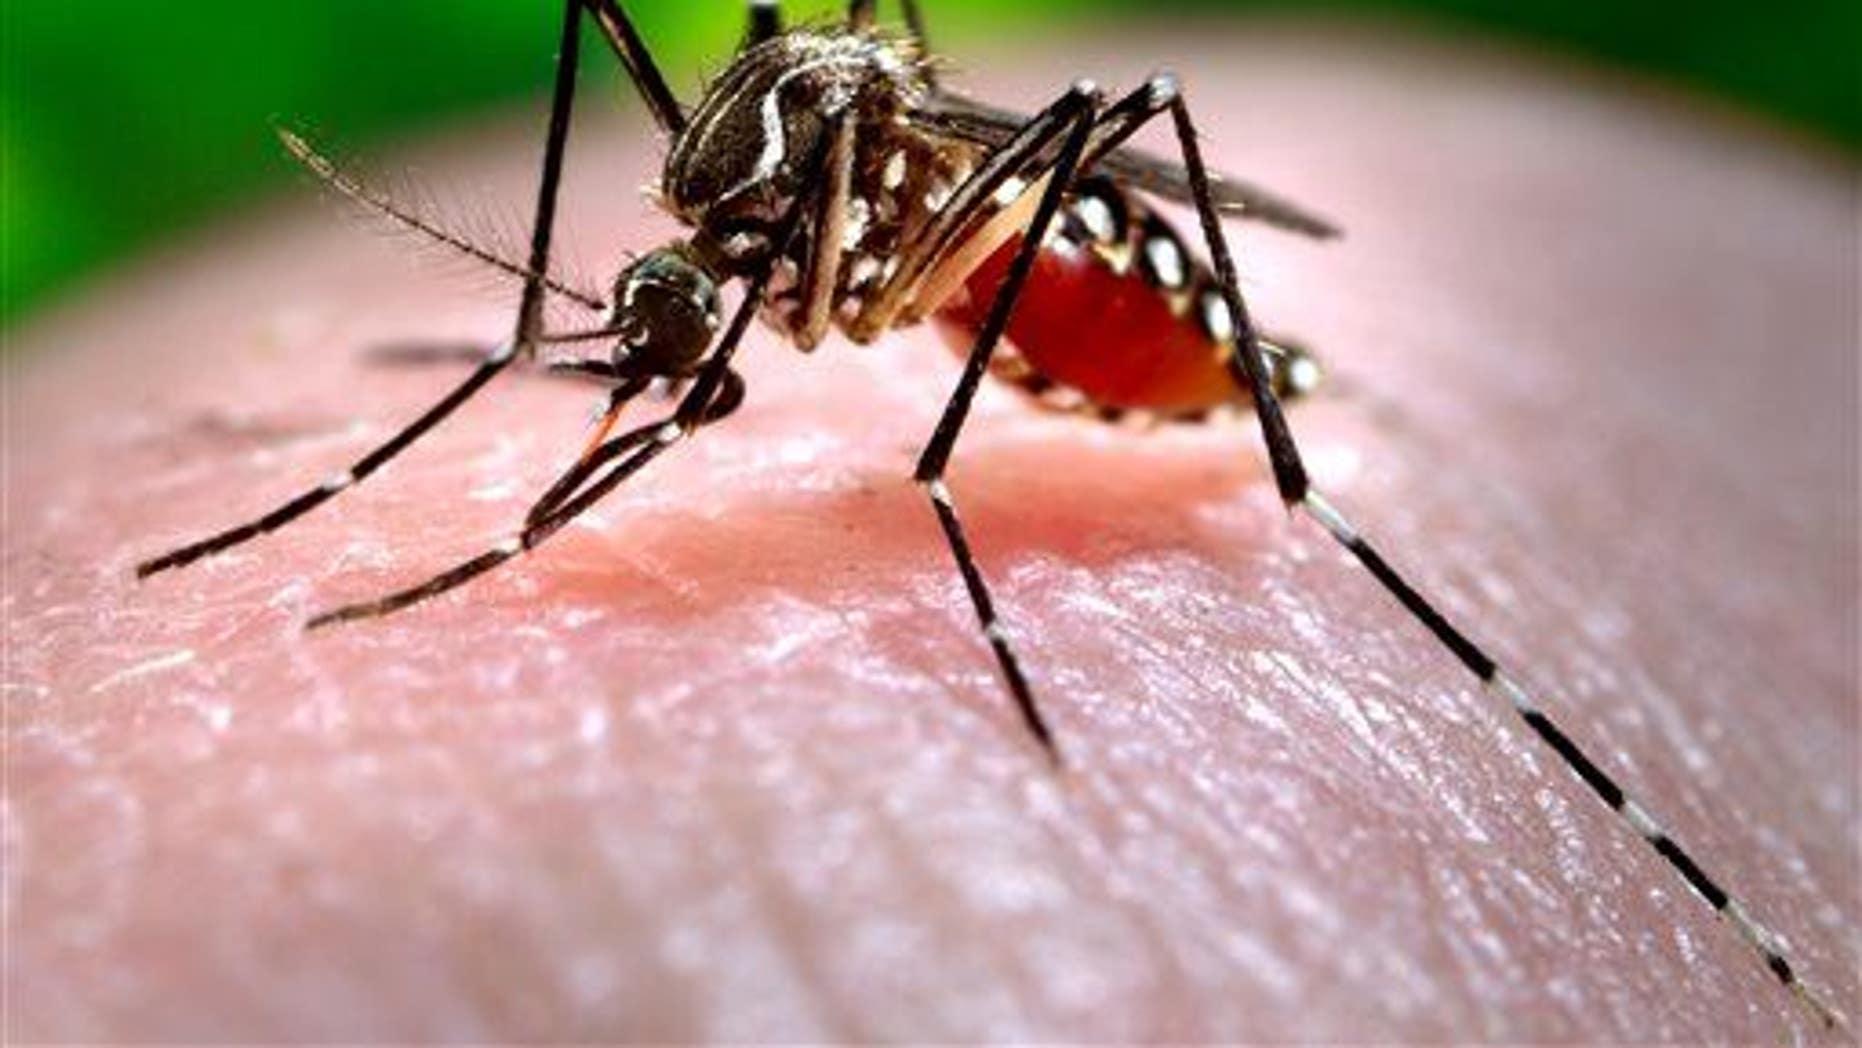 The Aedes aegypti mosquito carries Zika virus.